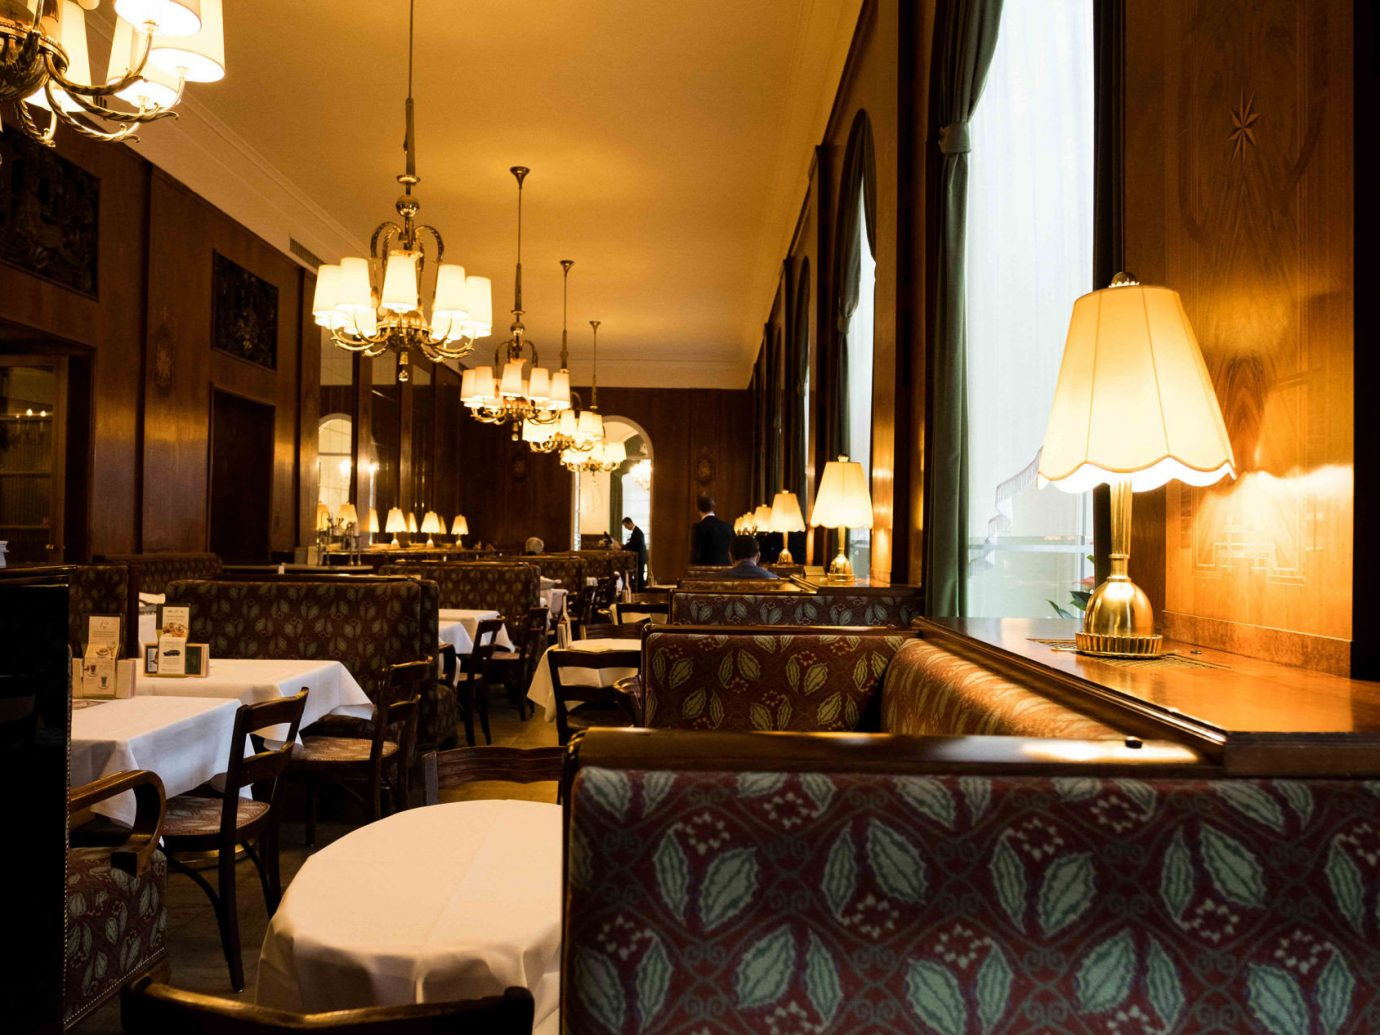 Tables at Café Landtmann in Vienna